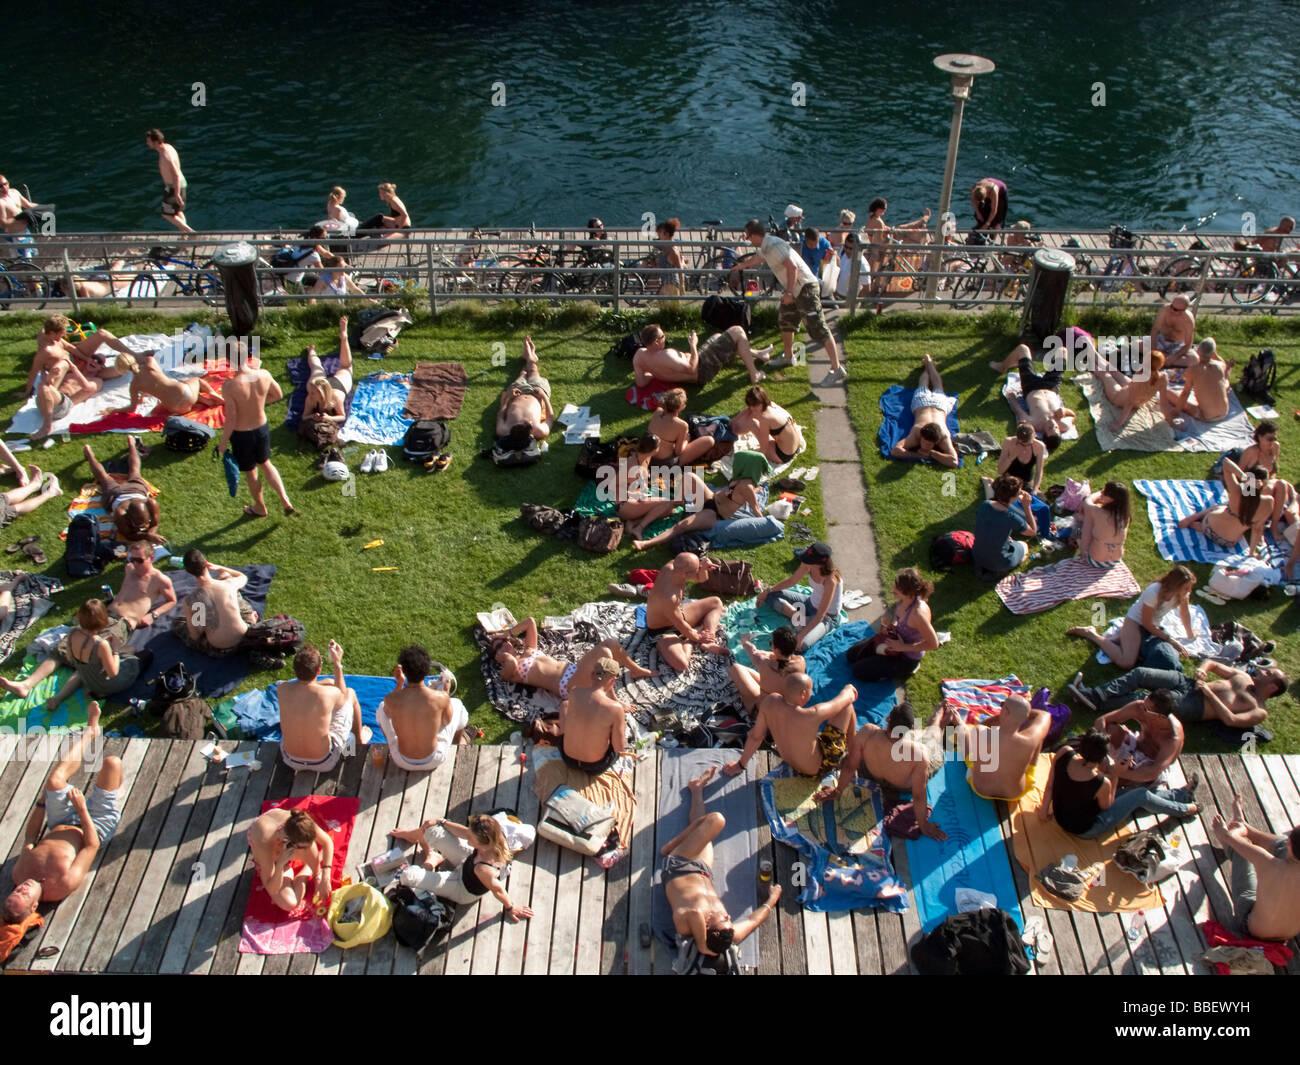 Open air bath Letten at river Limmat people sunbathing Zurich Switzerland    Stock Image. Open Air Bath Stock Photos   Open Air Bath Stock Images   Alamy